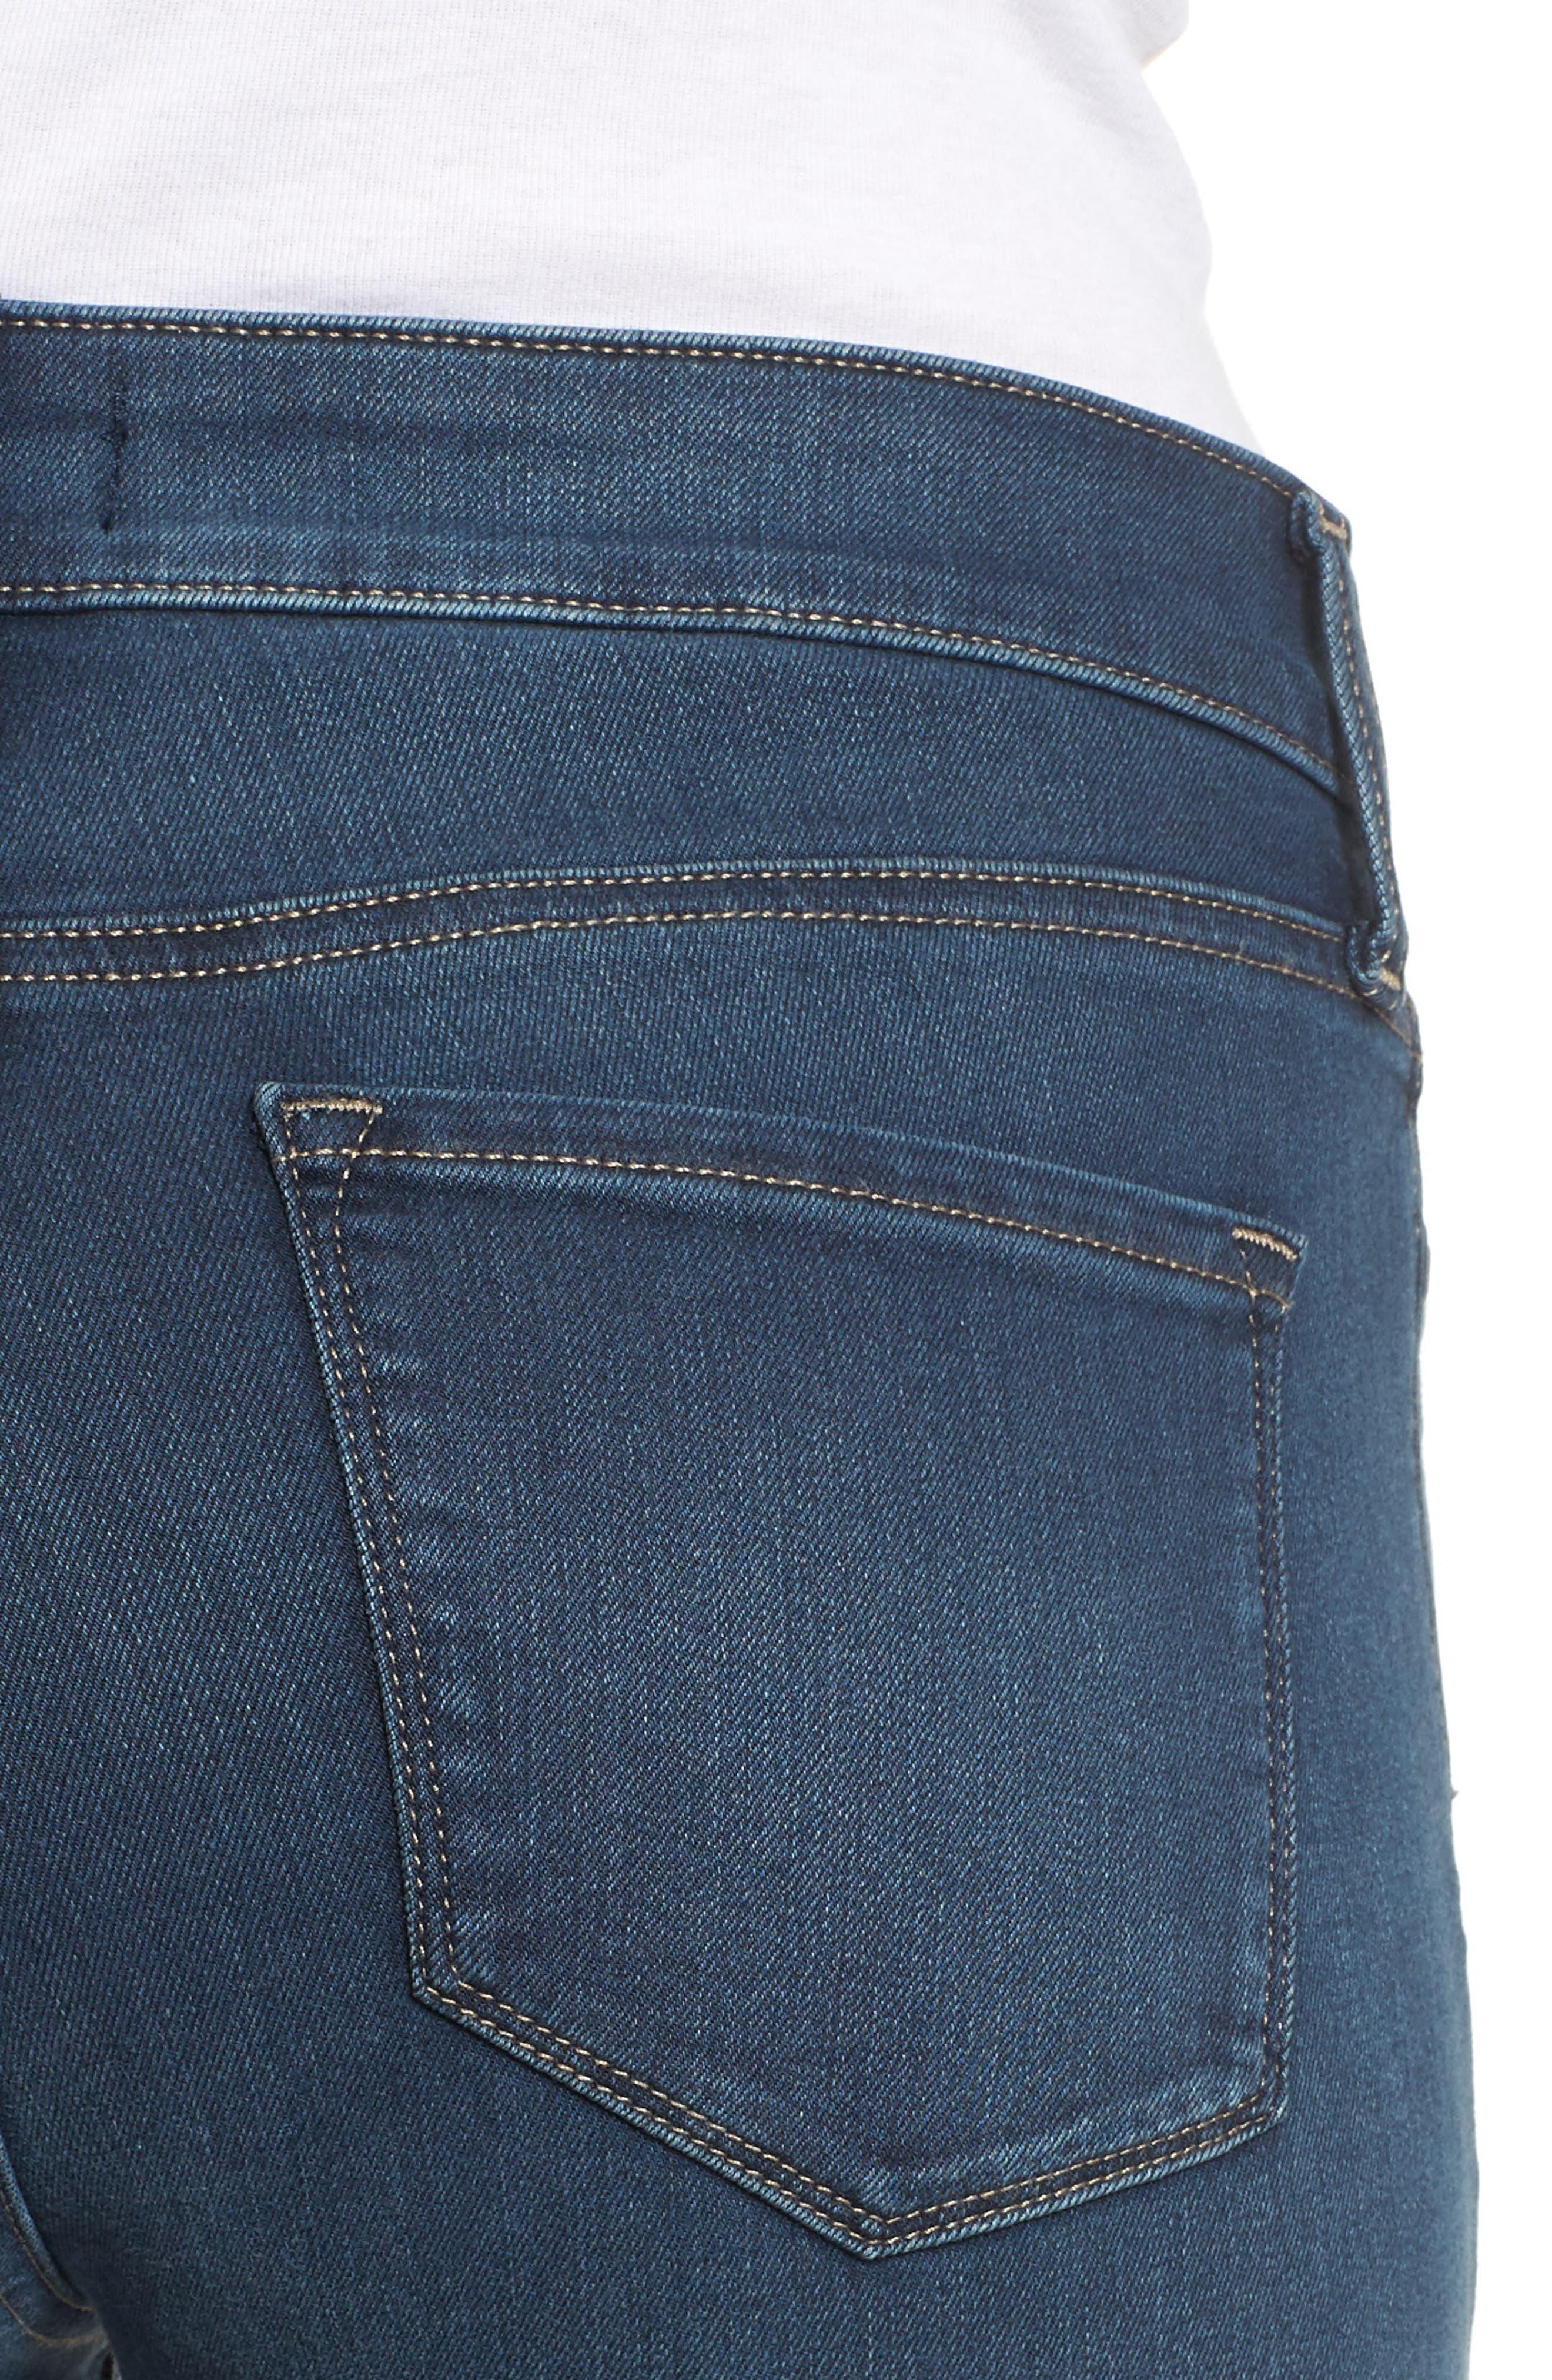 Ami Stretch Super Skinny Jeans,                             Alternate thumbnail 4, color,                             Rome